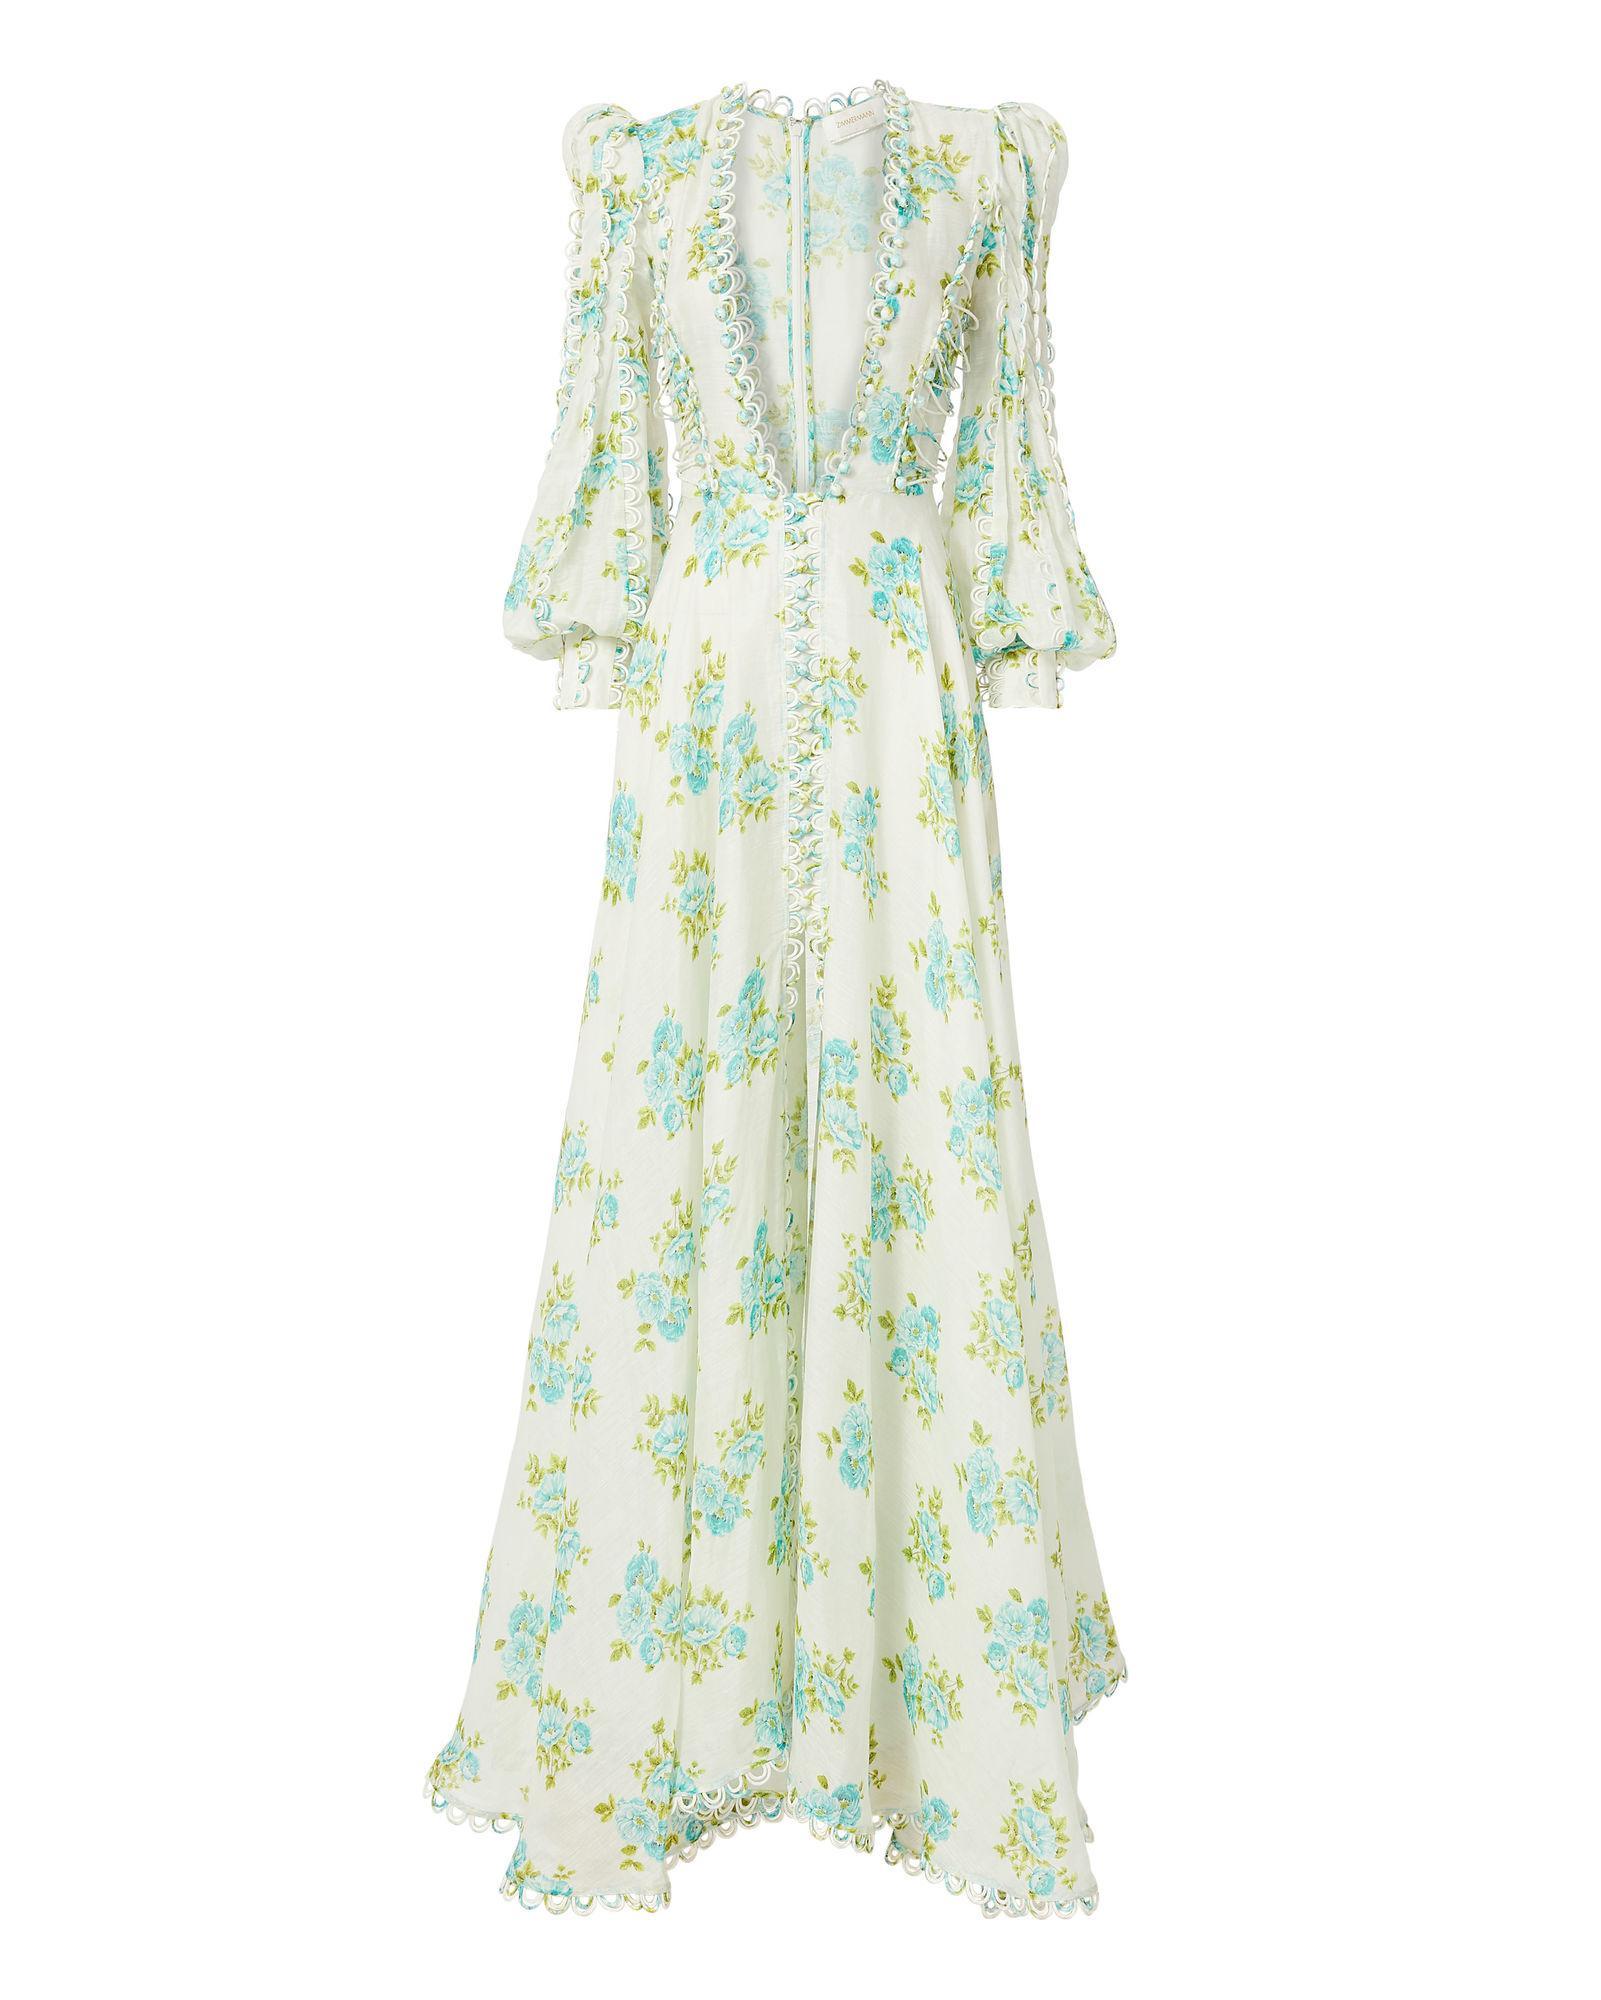 82caf4a1990f Zimmermann Whitewave Honeymooners Floral-Print Linen Maxi Dress In Green  Print